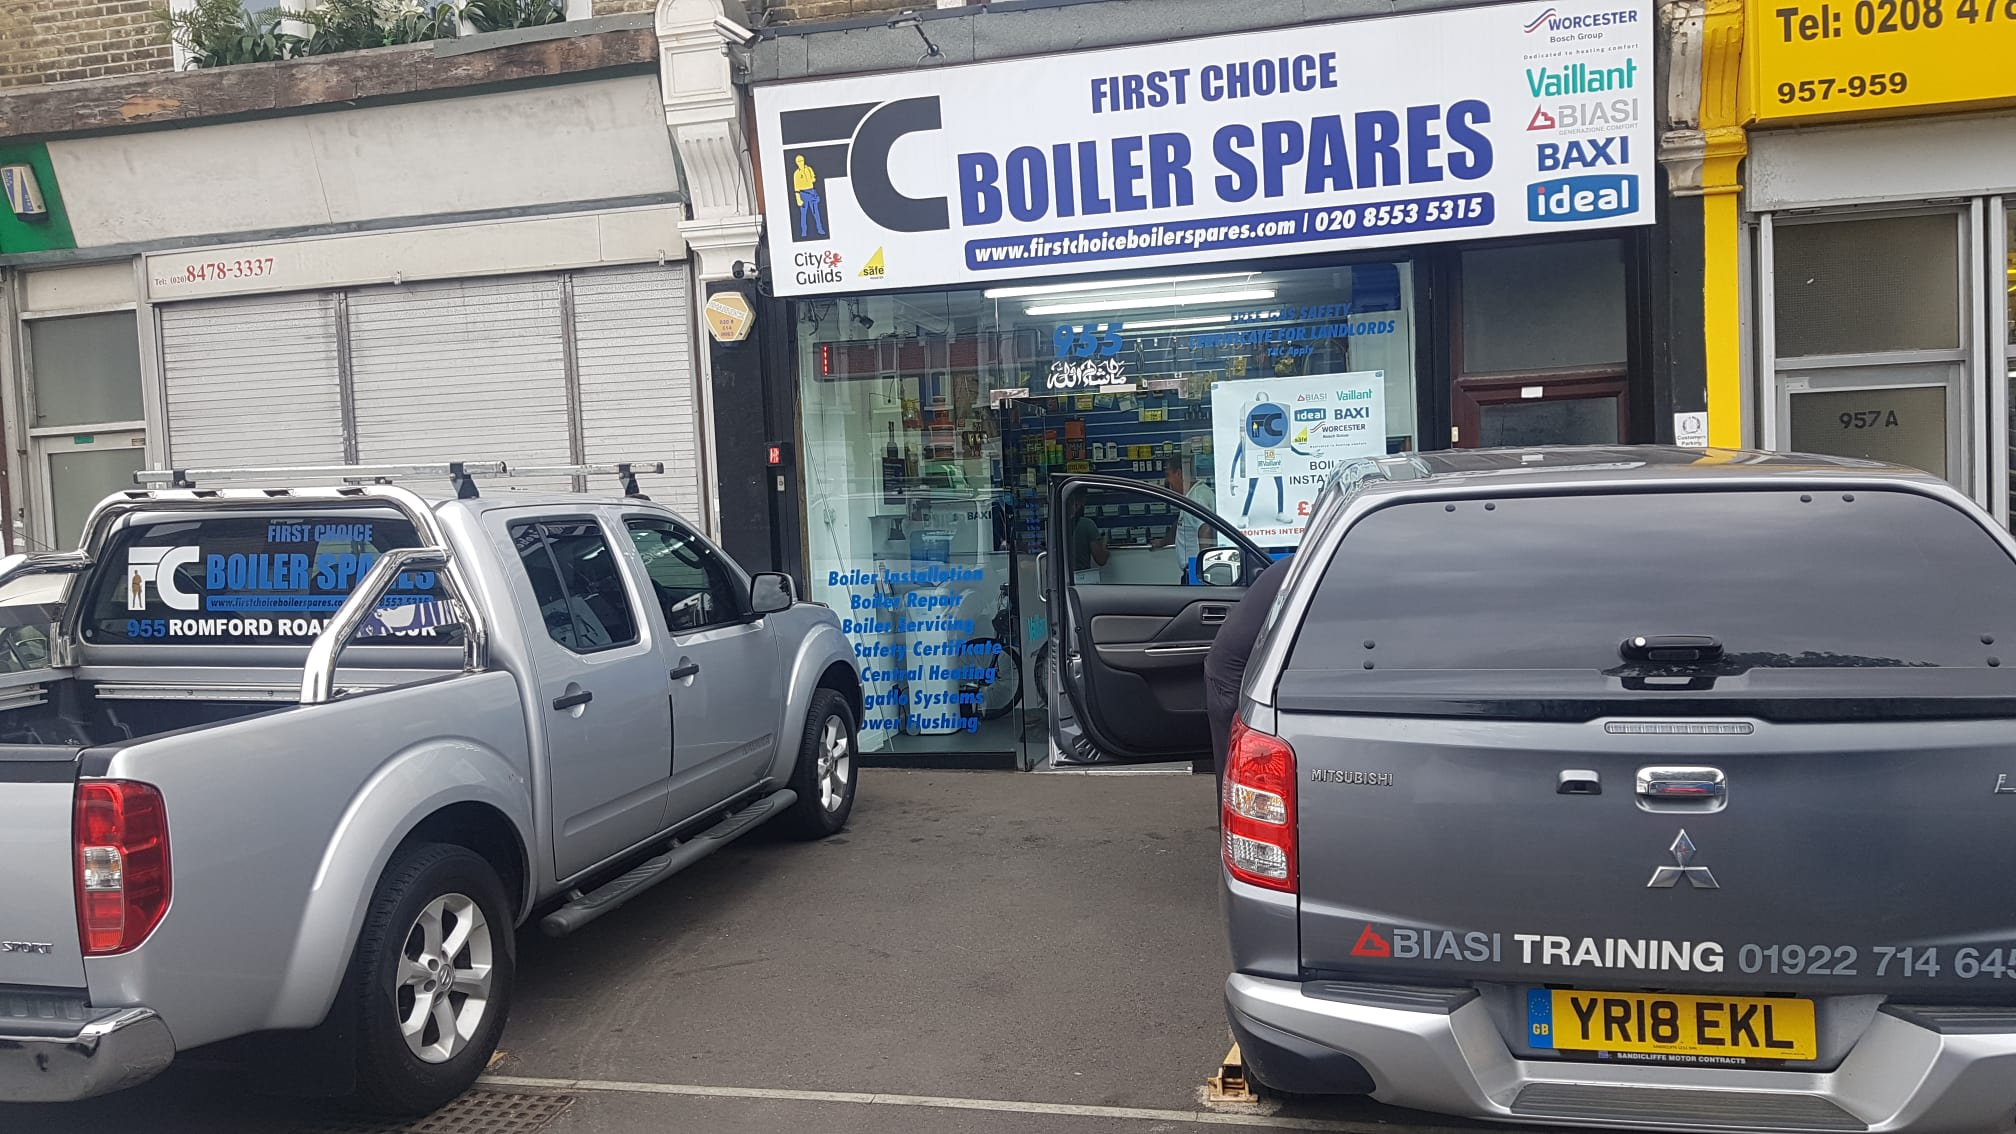 First Choice Boiler Spares